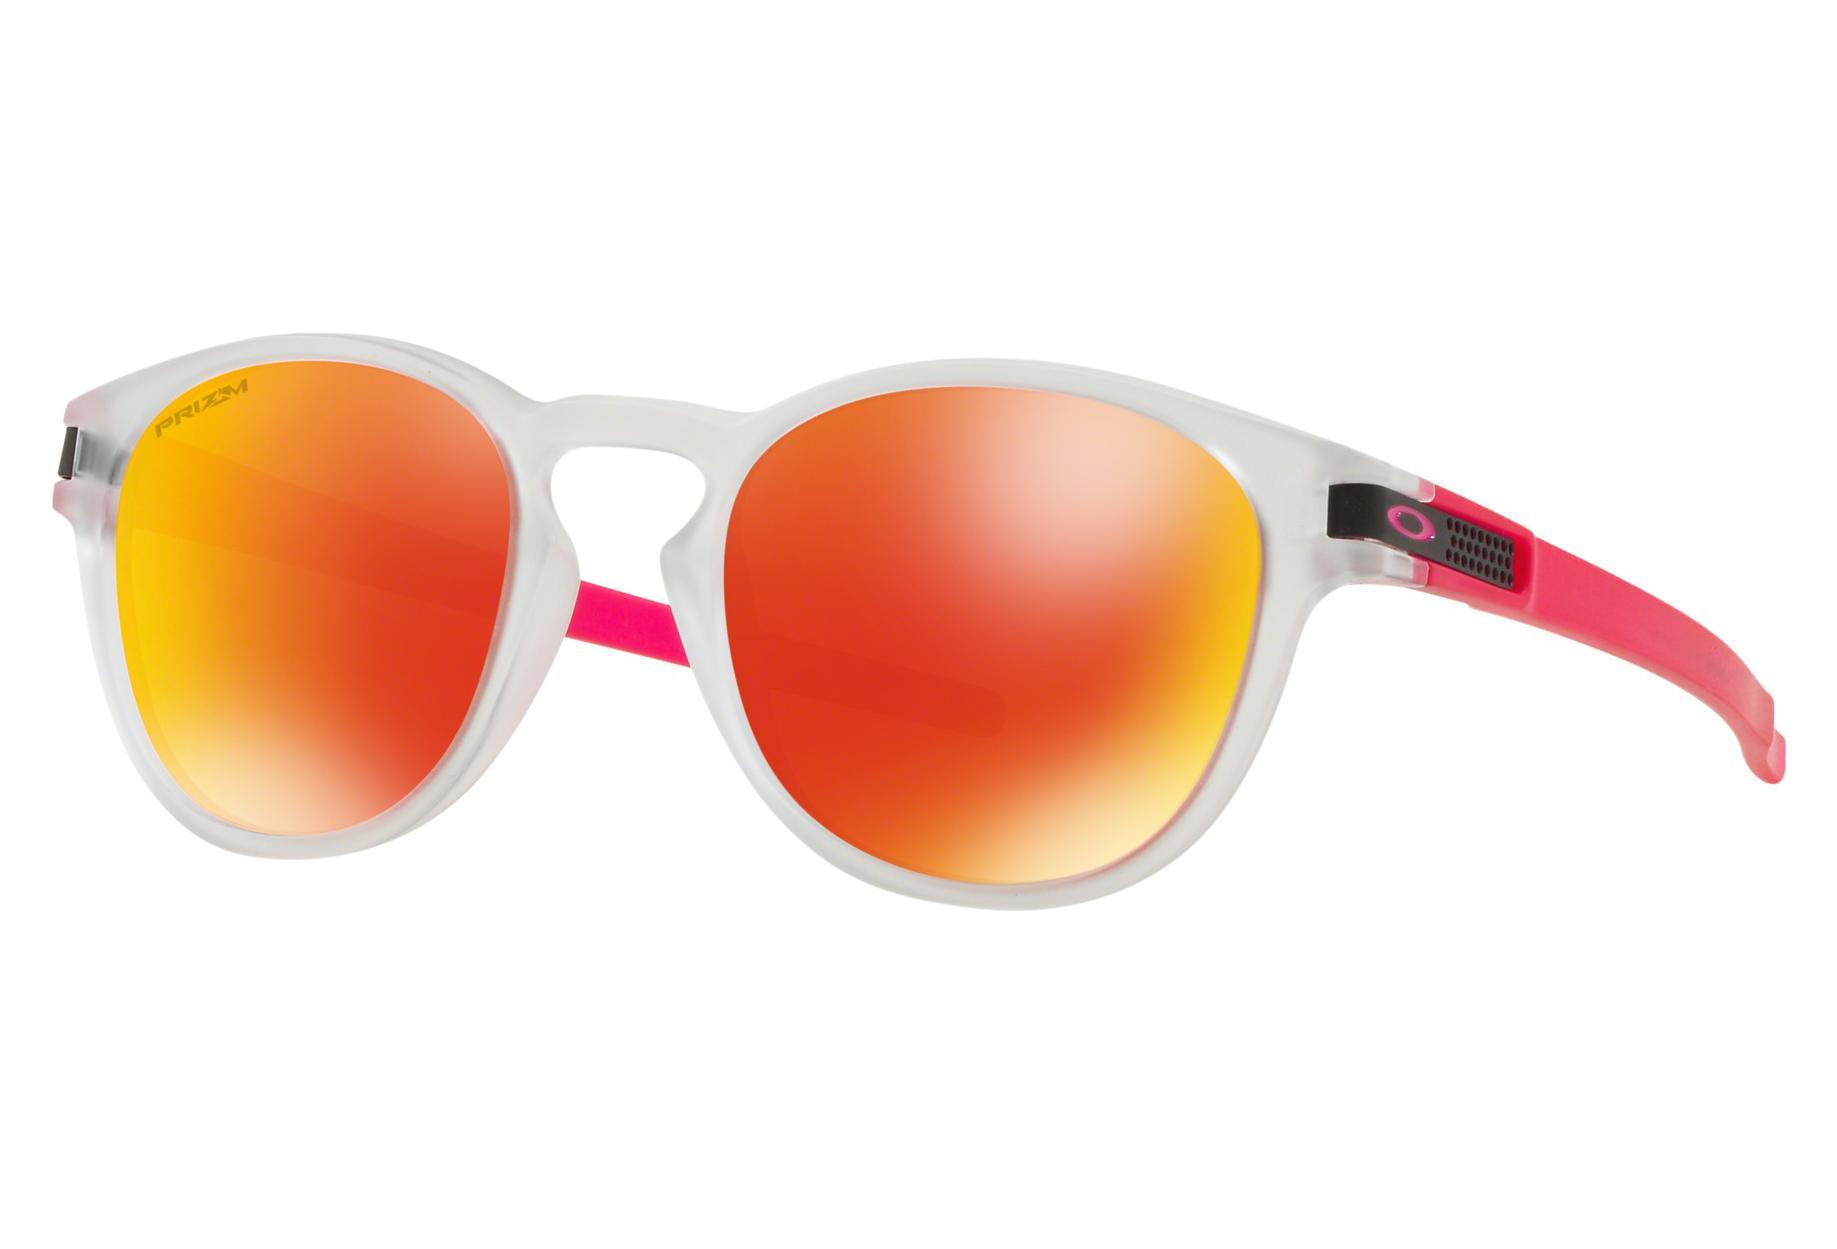 Oakley Sunglasses Latch Crystal Pop Matte Clear   Prizm Ruby   Ref.  OO9265-4753 508f2434970b